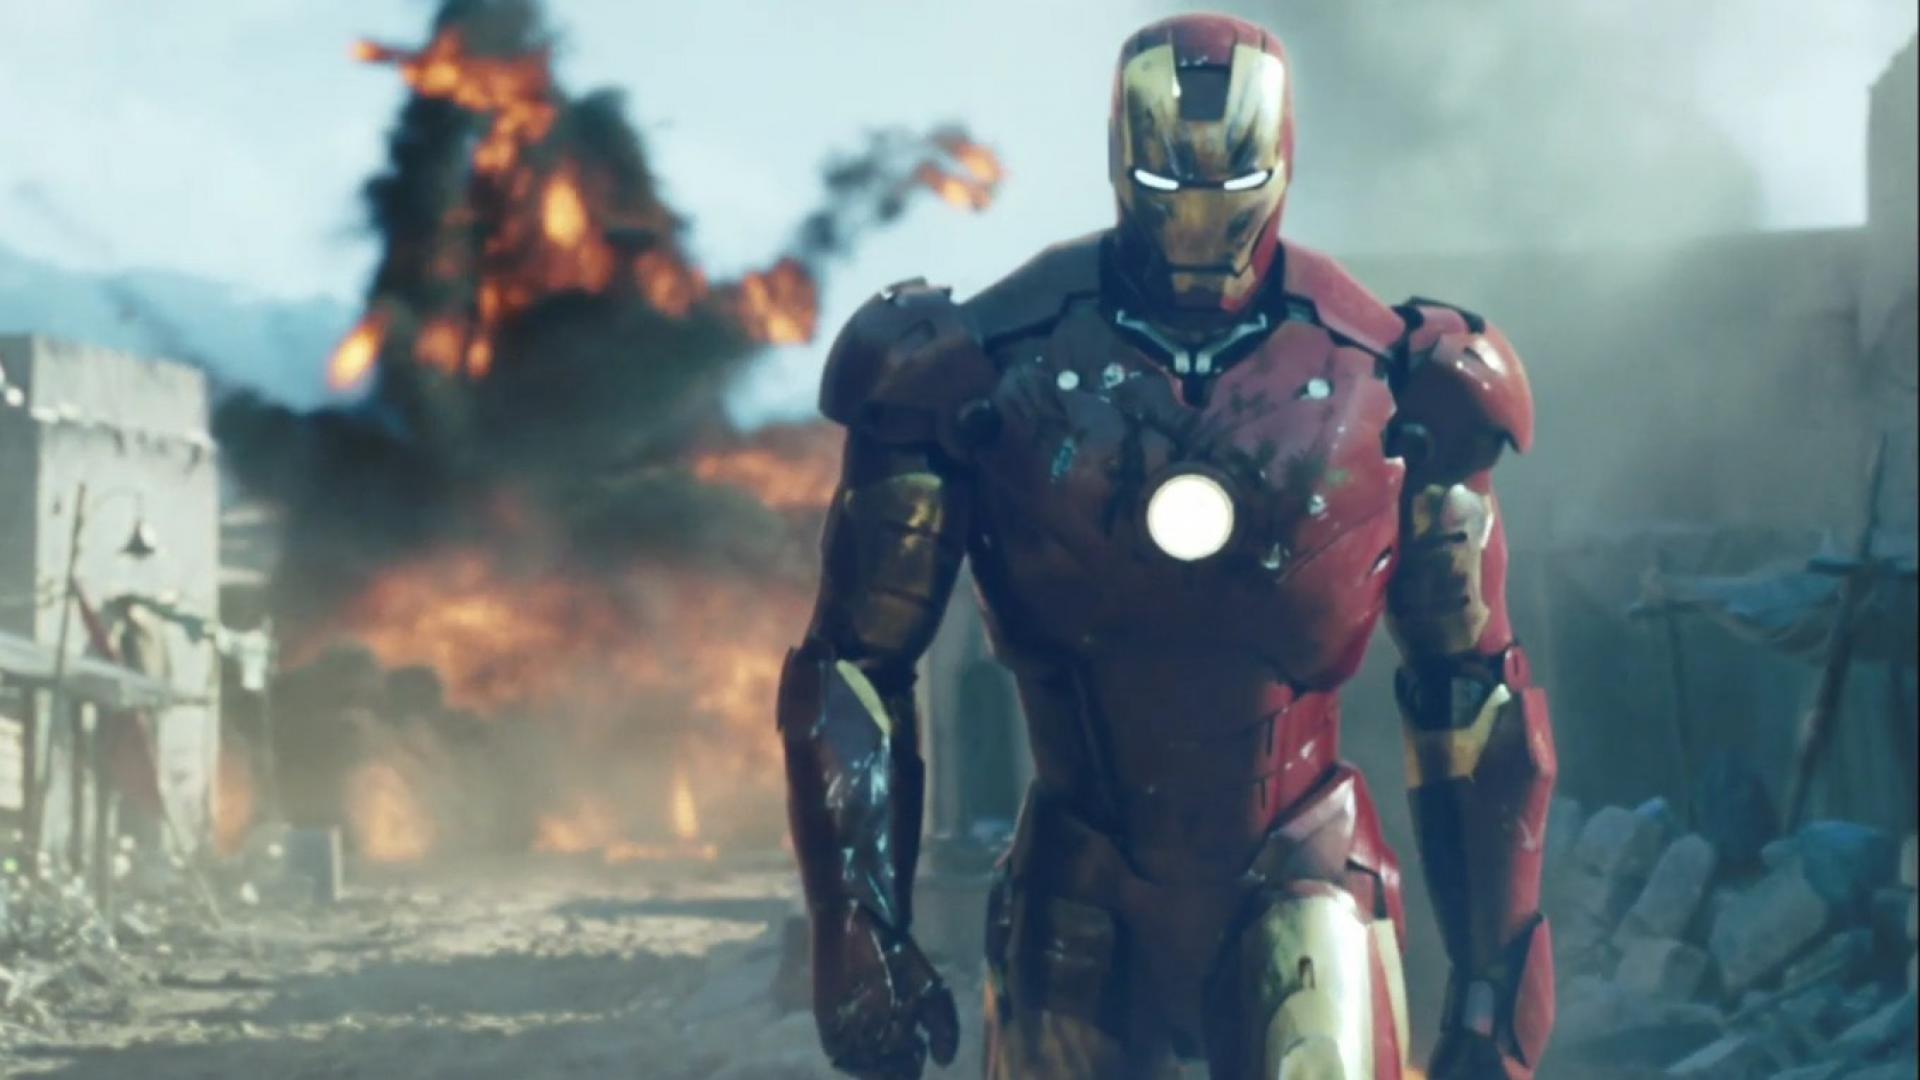 Supreme Wallpaper Iphone 5 Robert Downey Jr Iron Man Wallpaper 71 Images